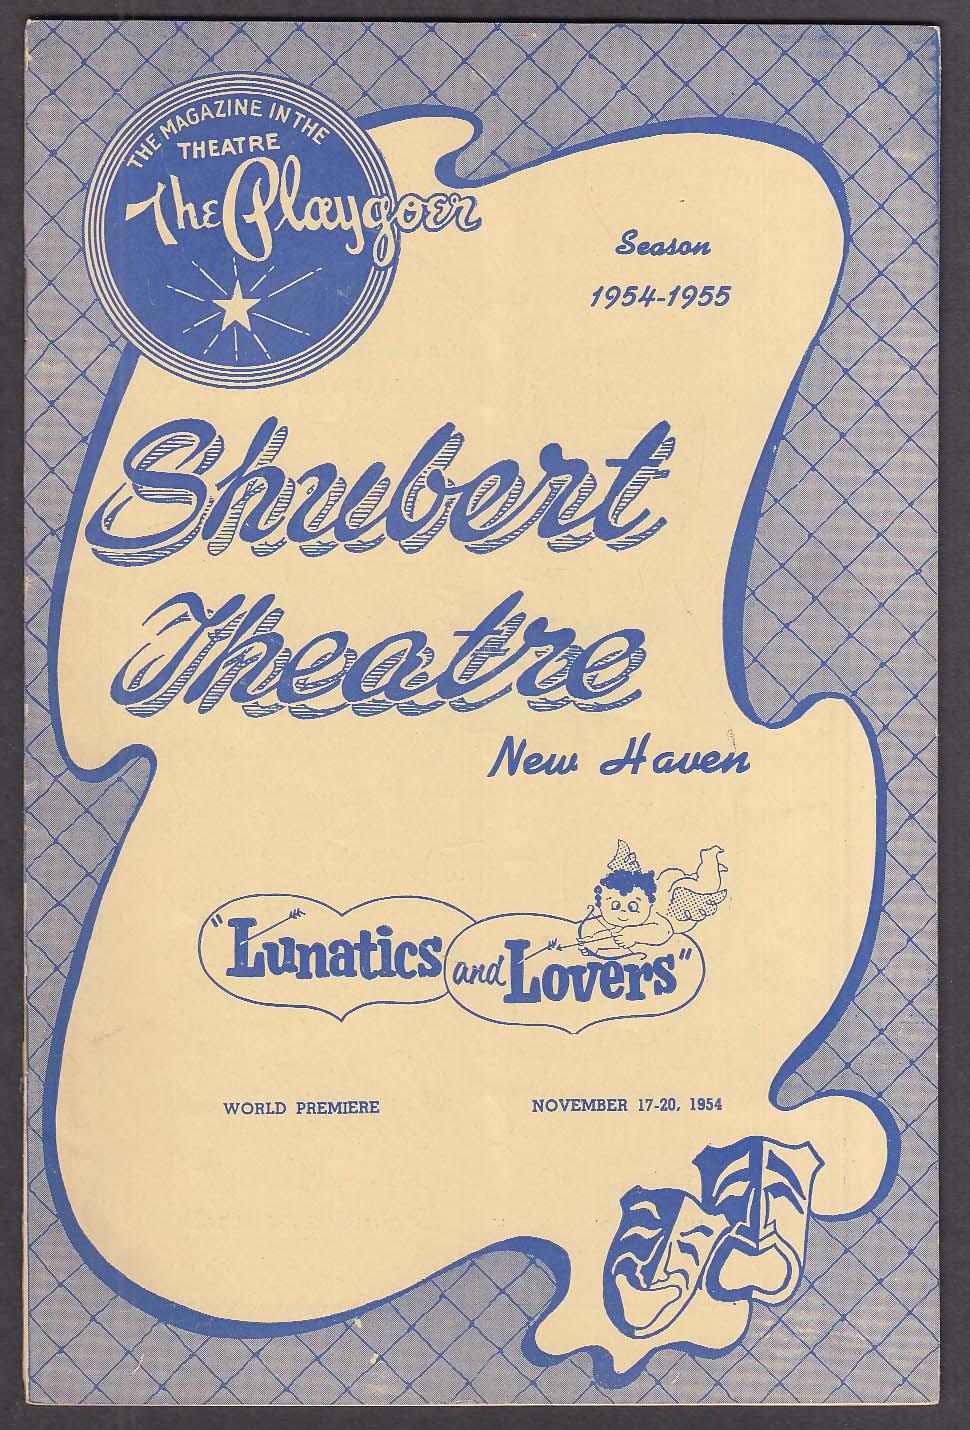 Buddy Hackett Lunatics & Lovers World Premiere Shubert Theatre program 1954